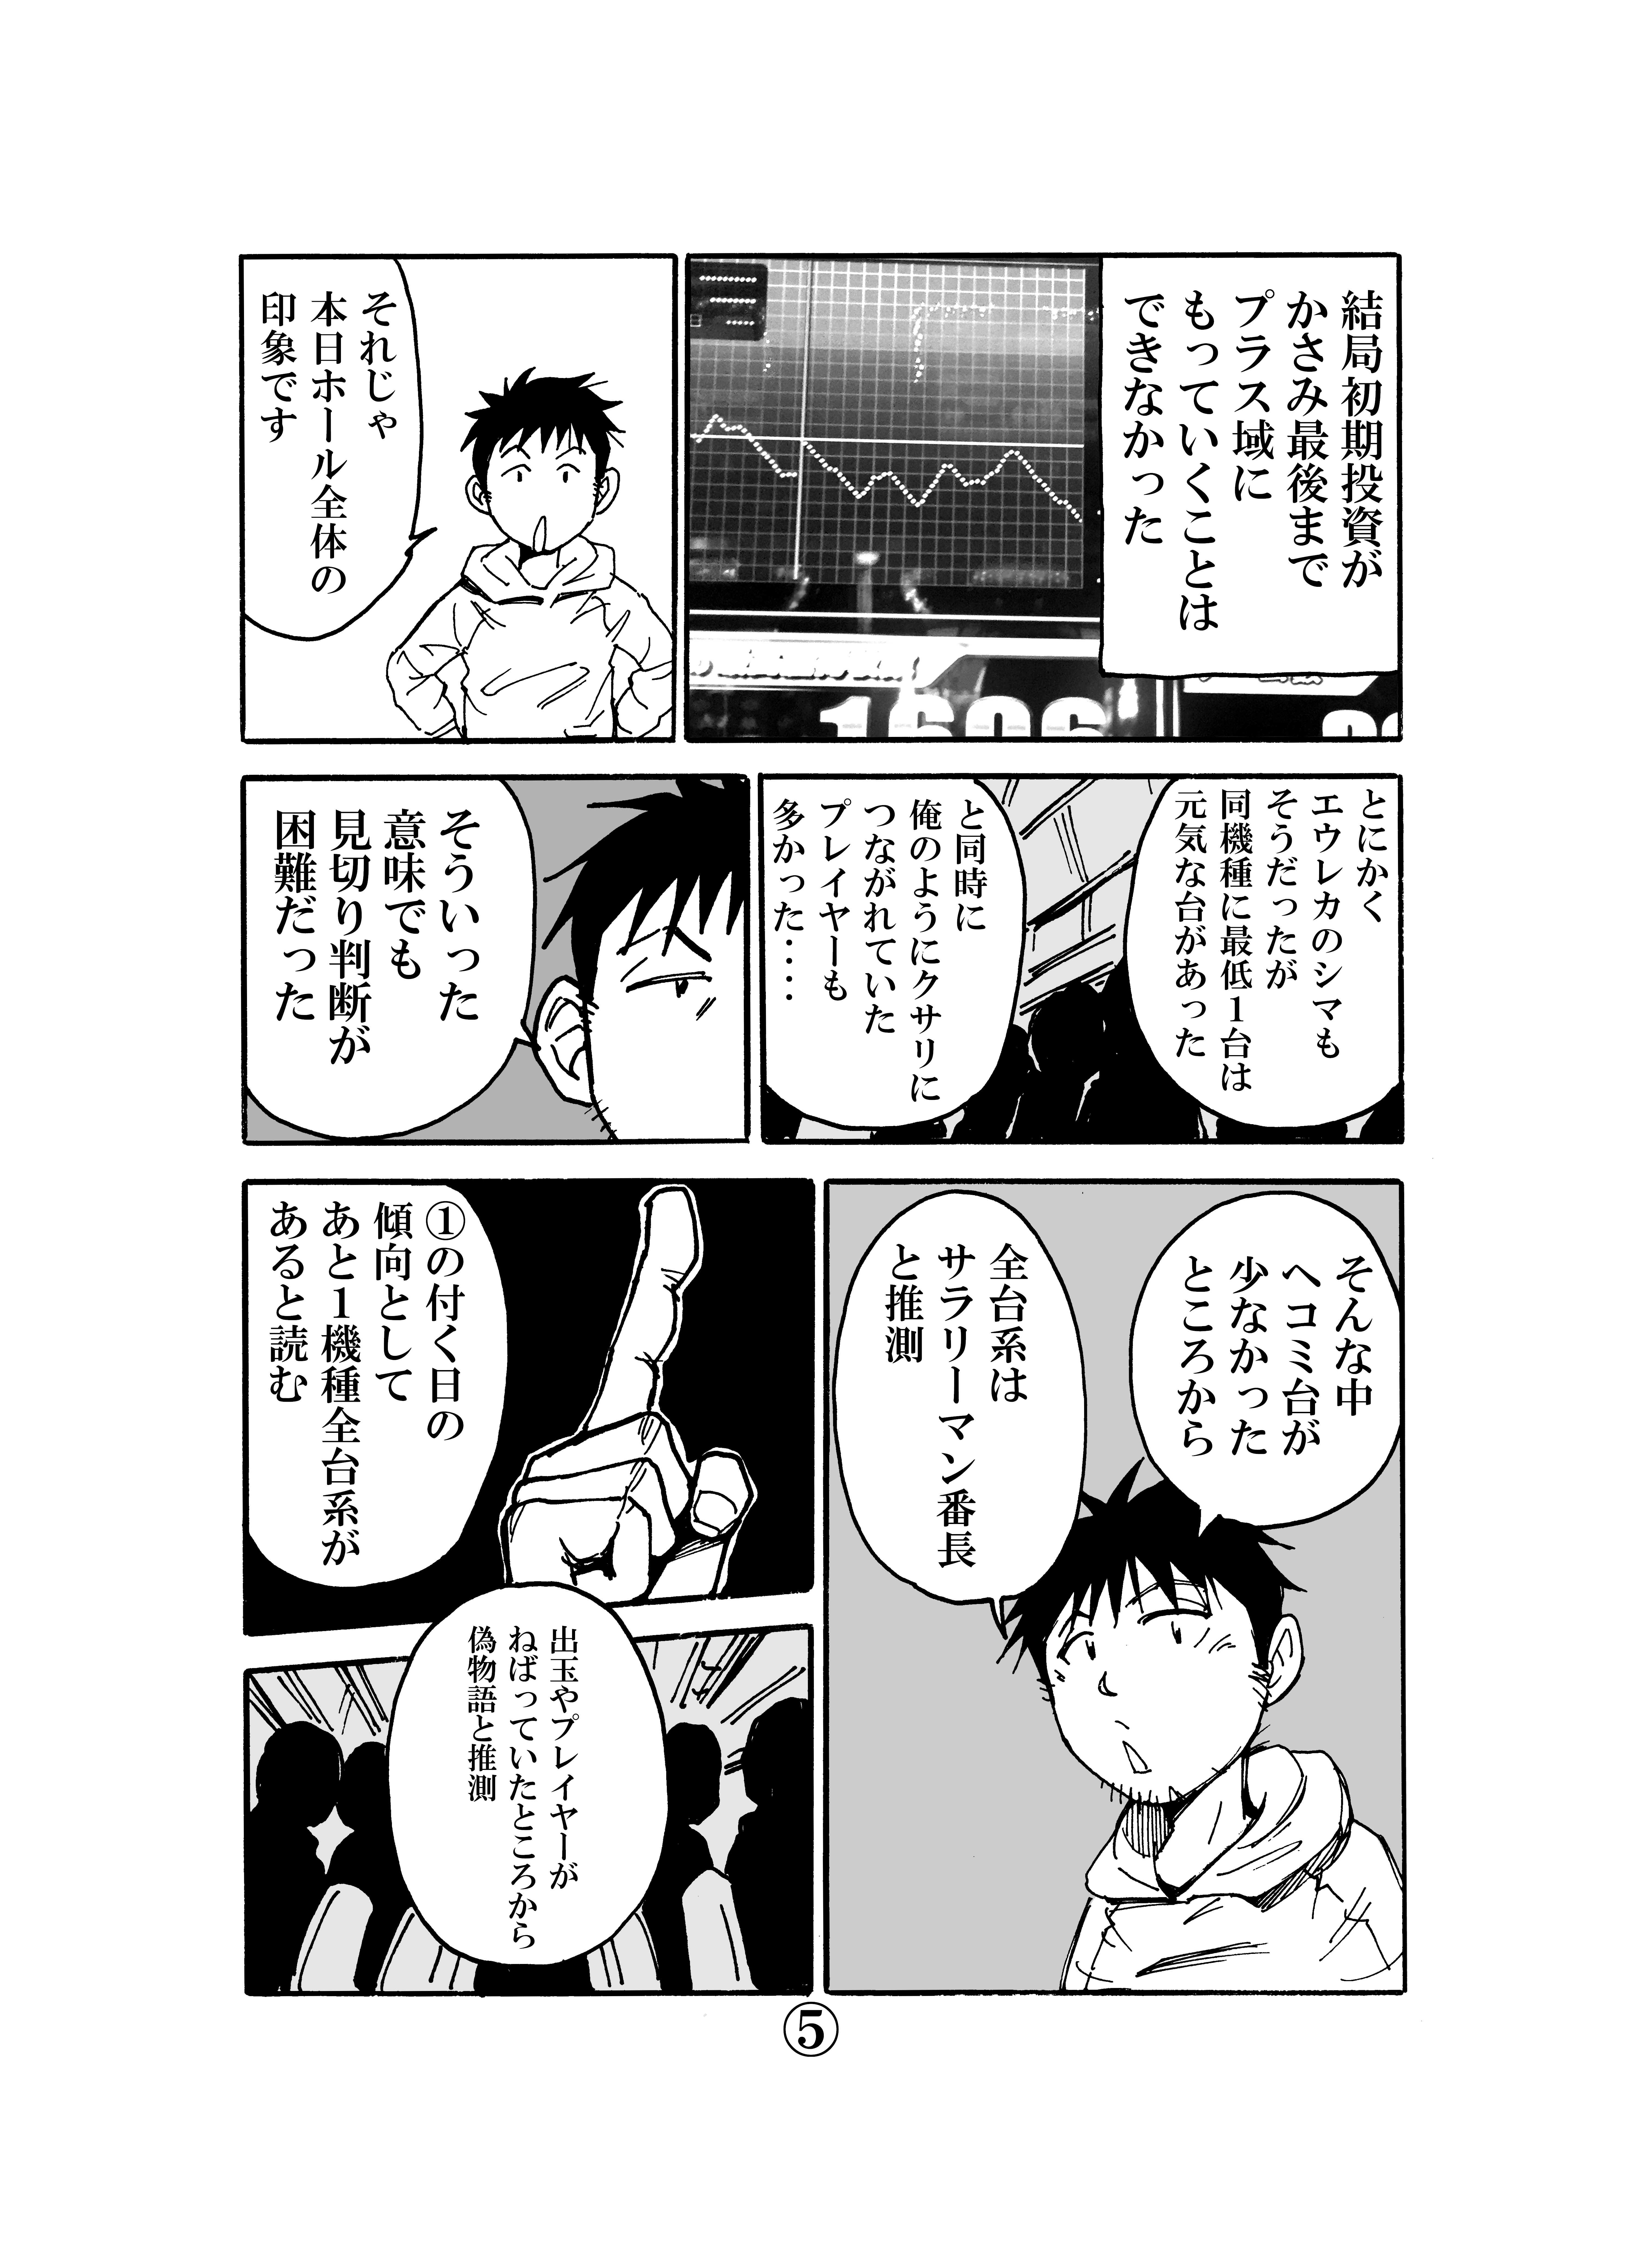 11/21⑤